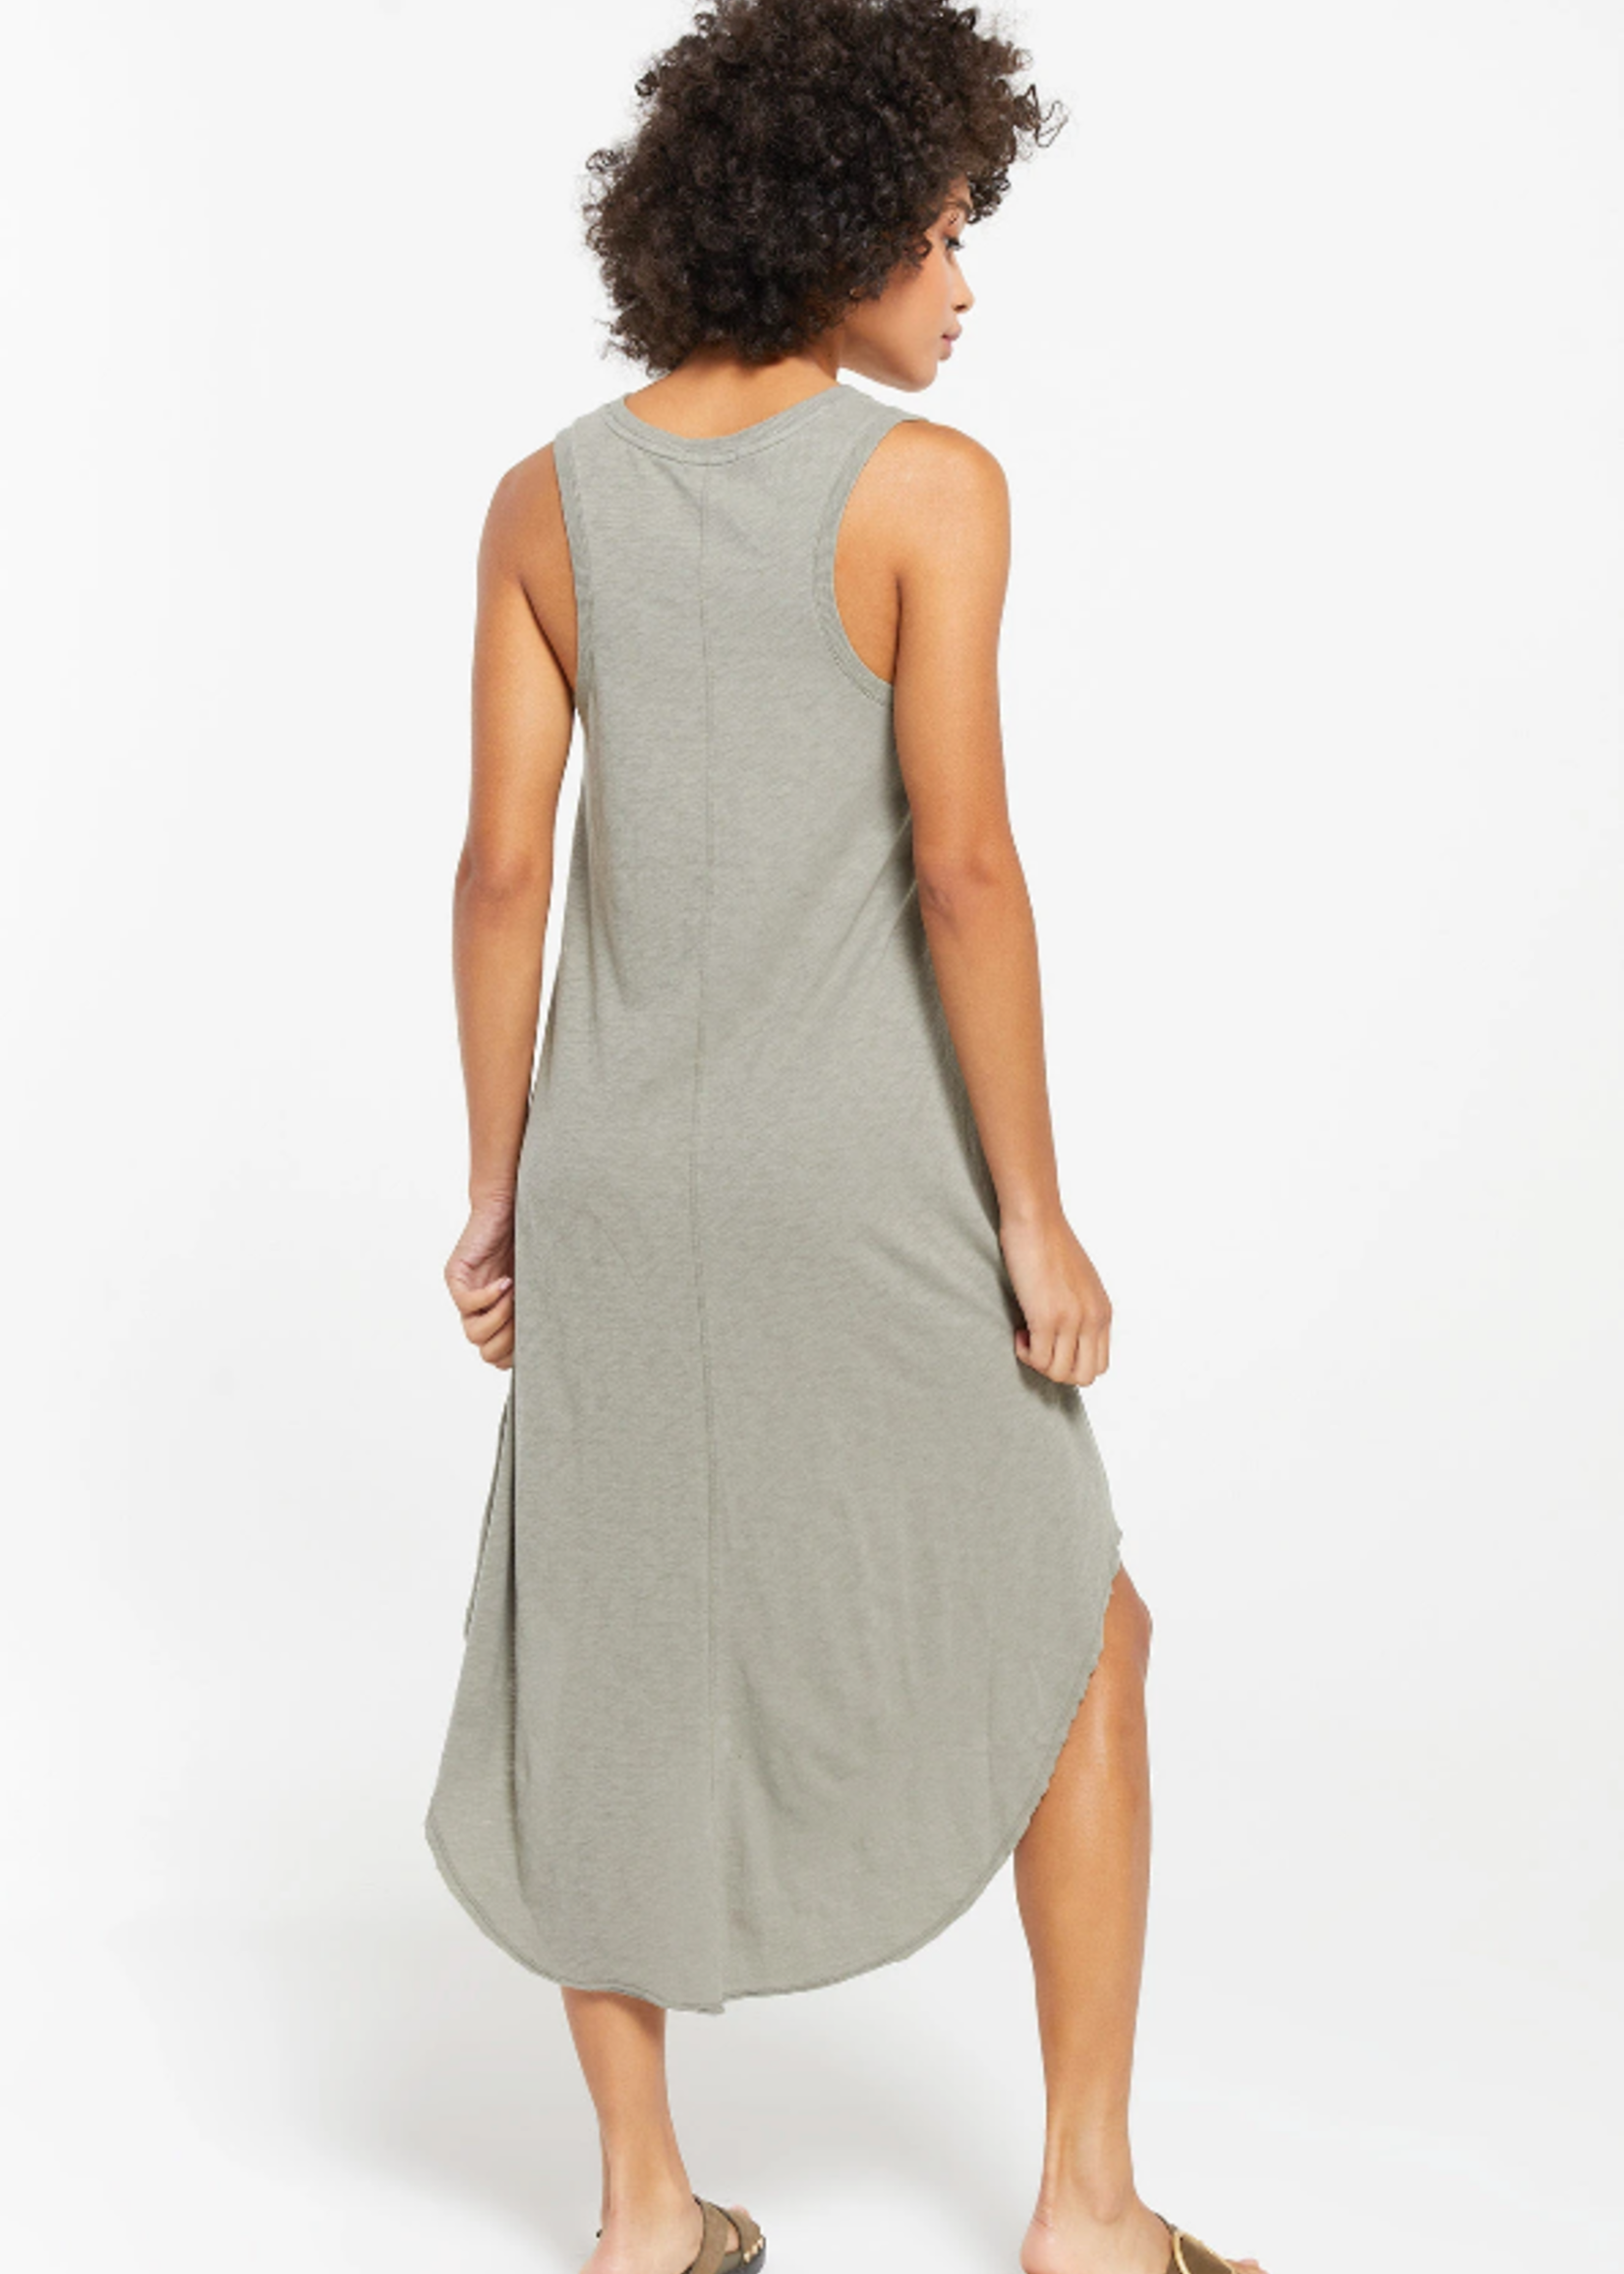 Z Supply Reverie Dress - Dusty Sage